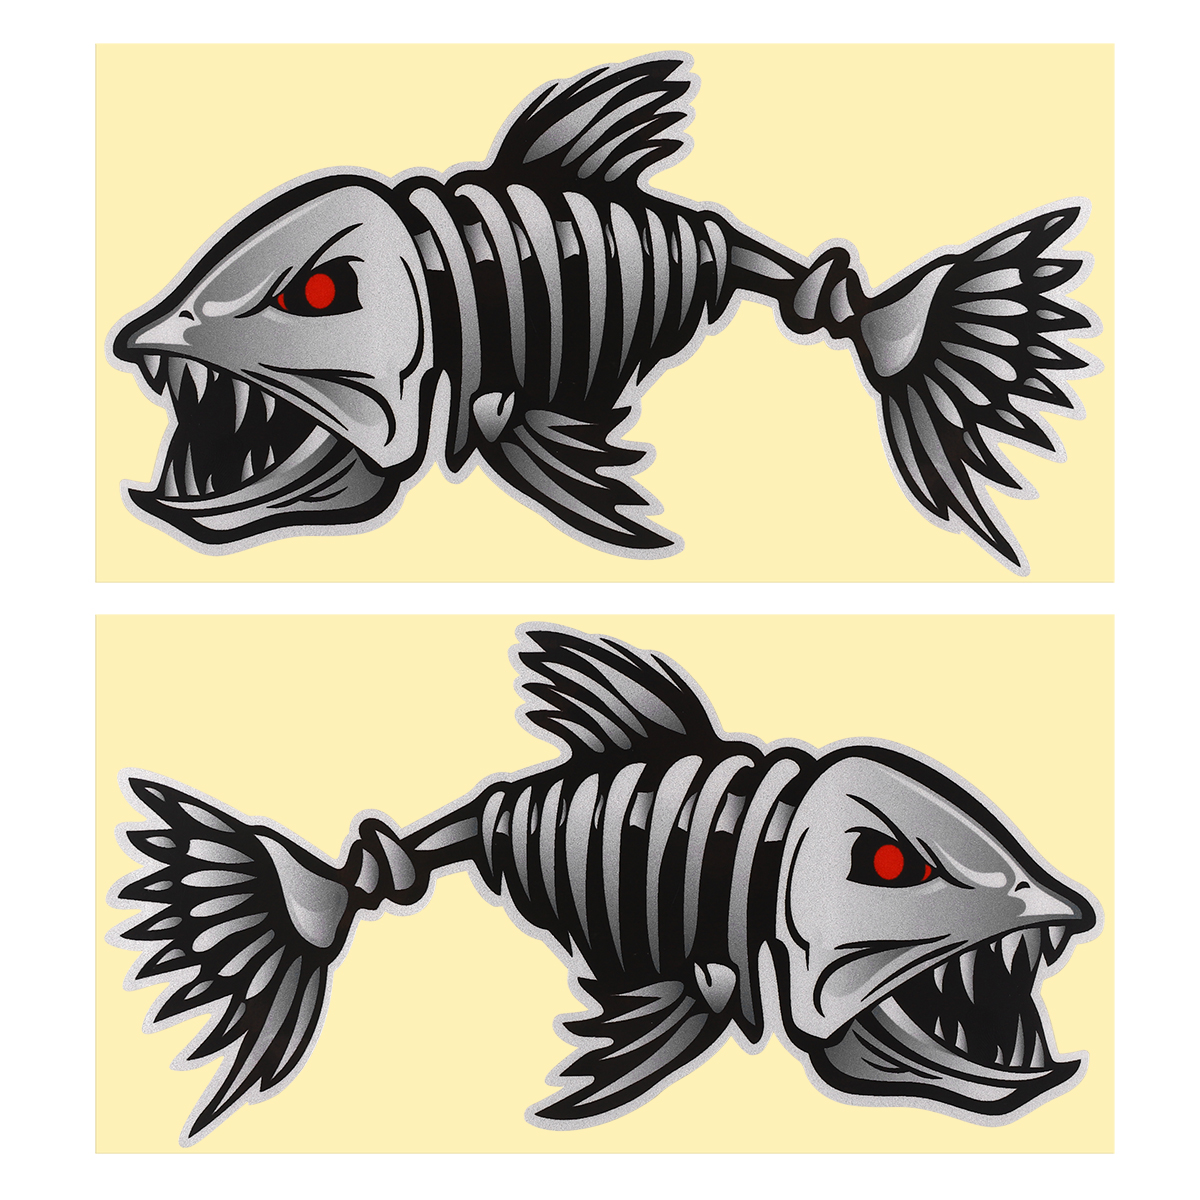 SKELETON BONE FISH SET Vinyl Decal Sticker Window Car Fishing Boat